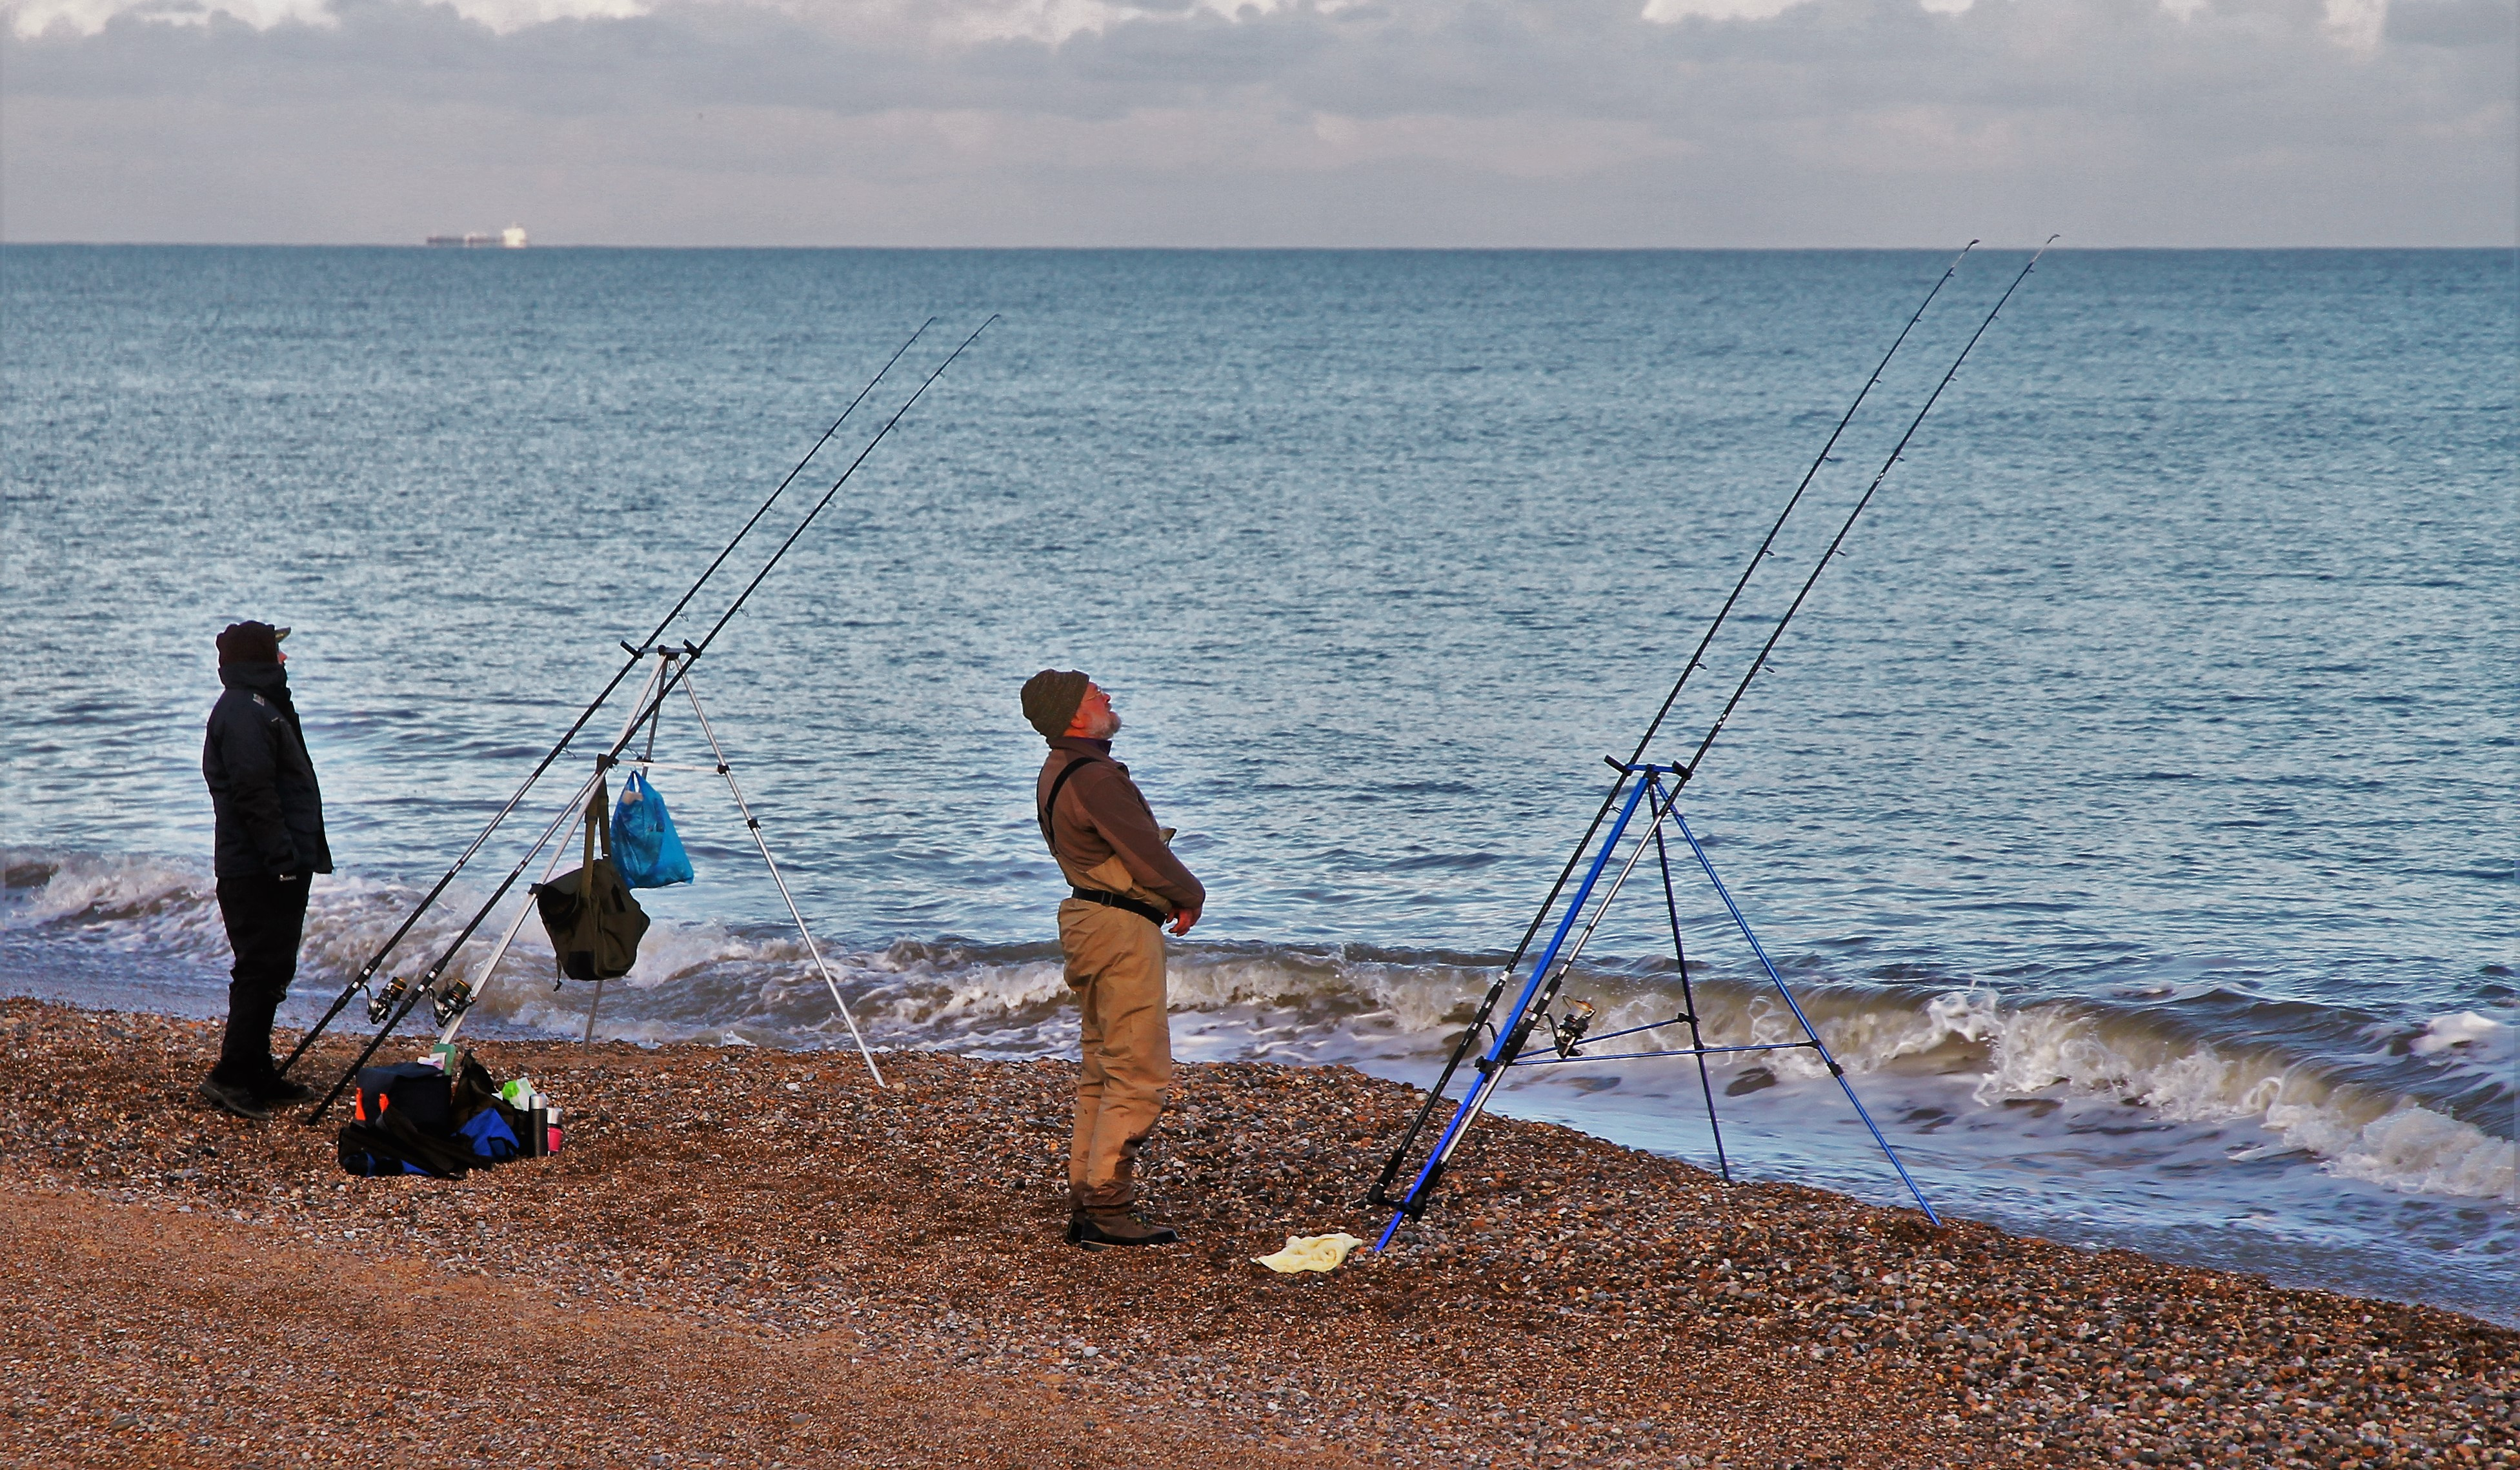 fishing-on-dunwich-beach-by-paul-waite